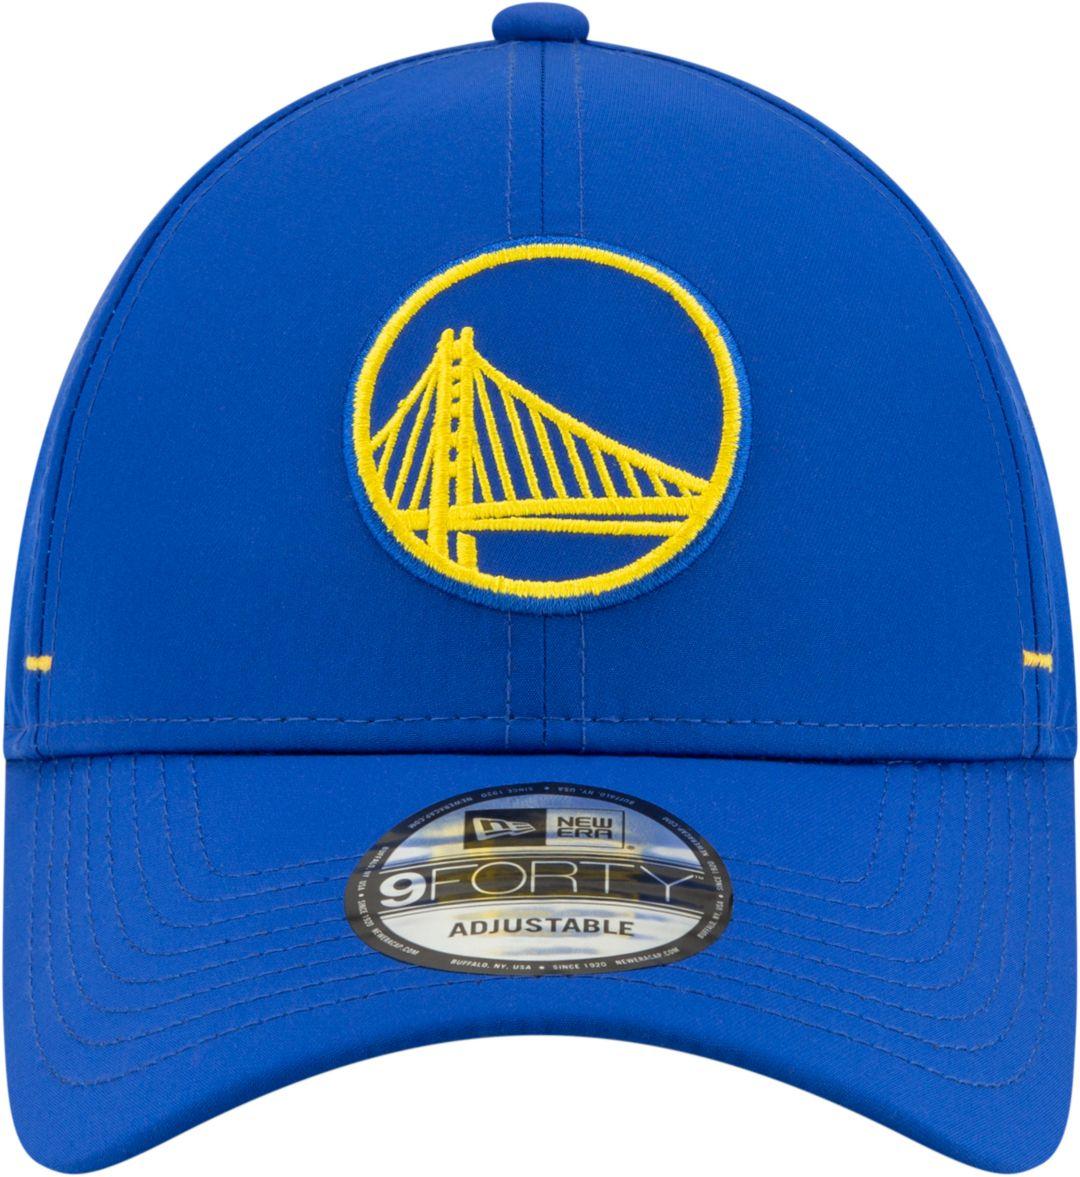 The City Golden State Warriors Curved Brim Adjustable 9 FORTY New ERA Fan Apparel & Souvenirs Sports Mem, Cards & Fan Shop